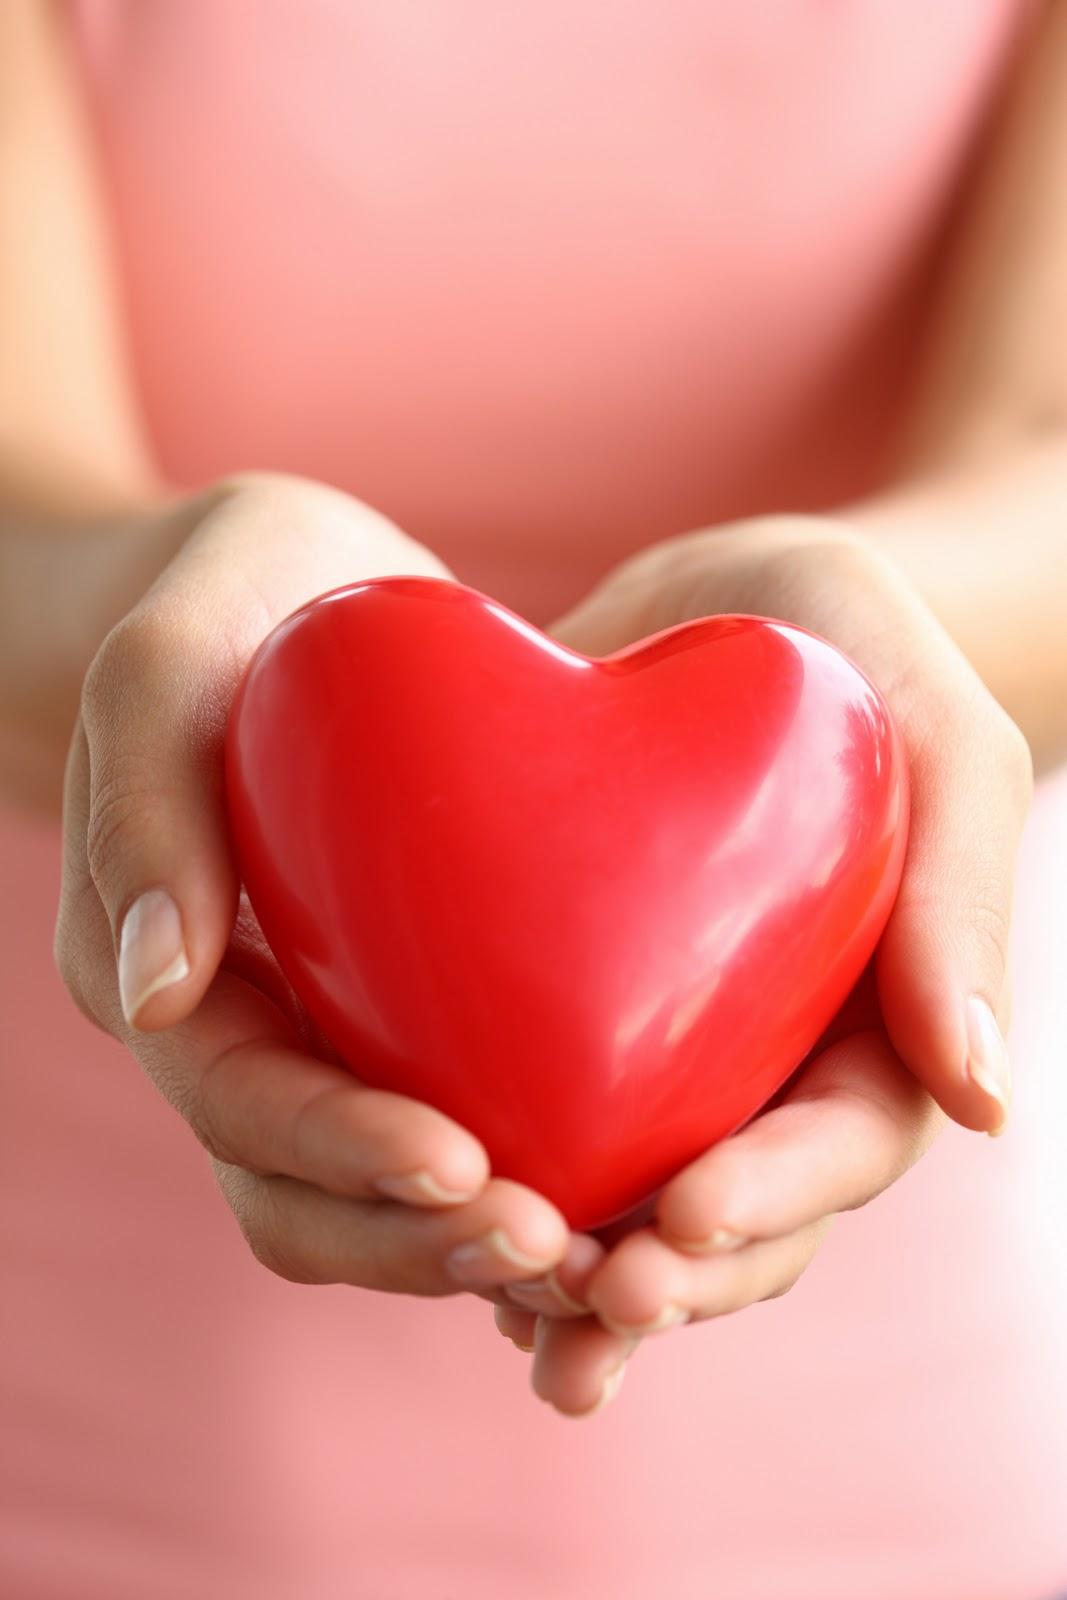 Подари мне свое сердце подари мне свою руку